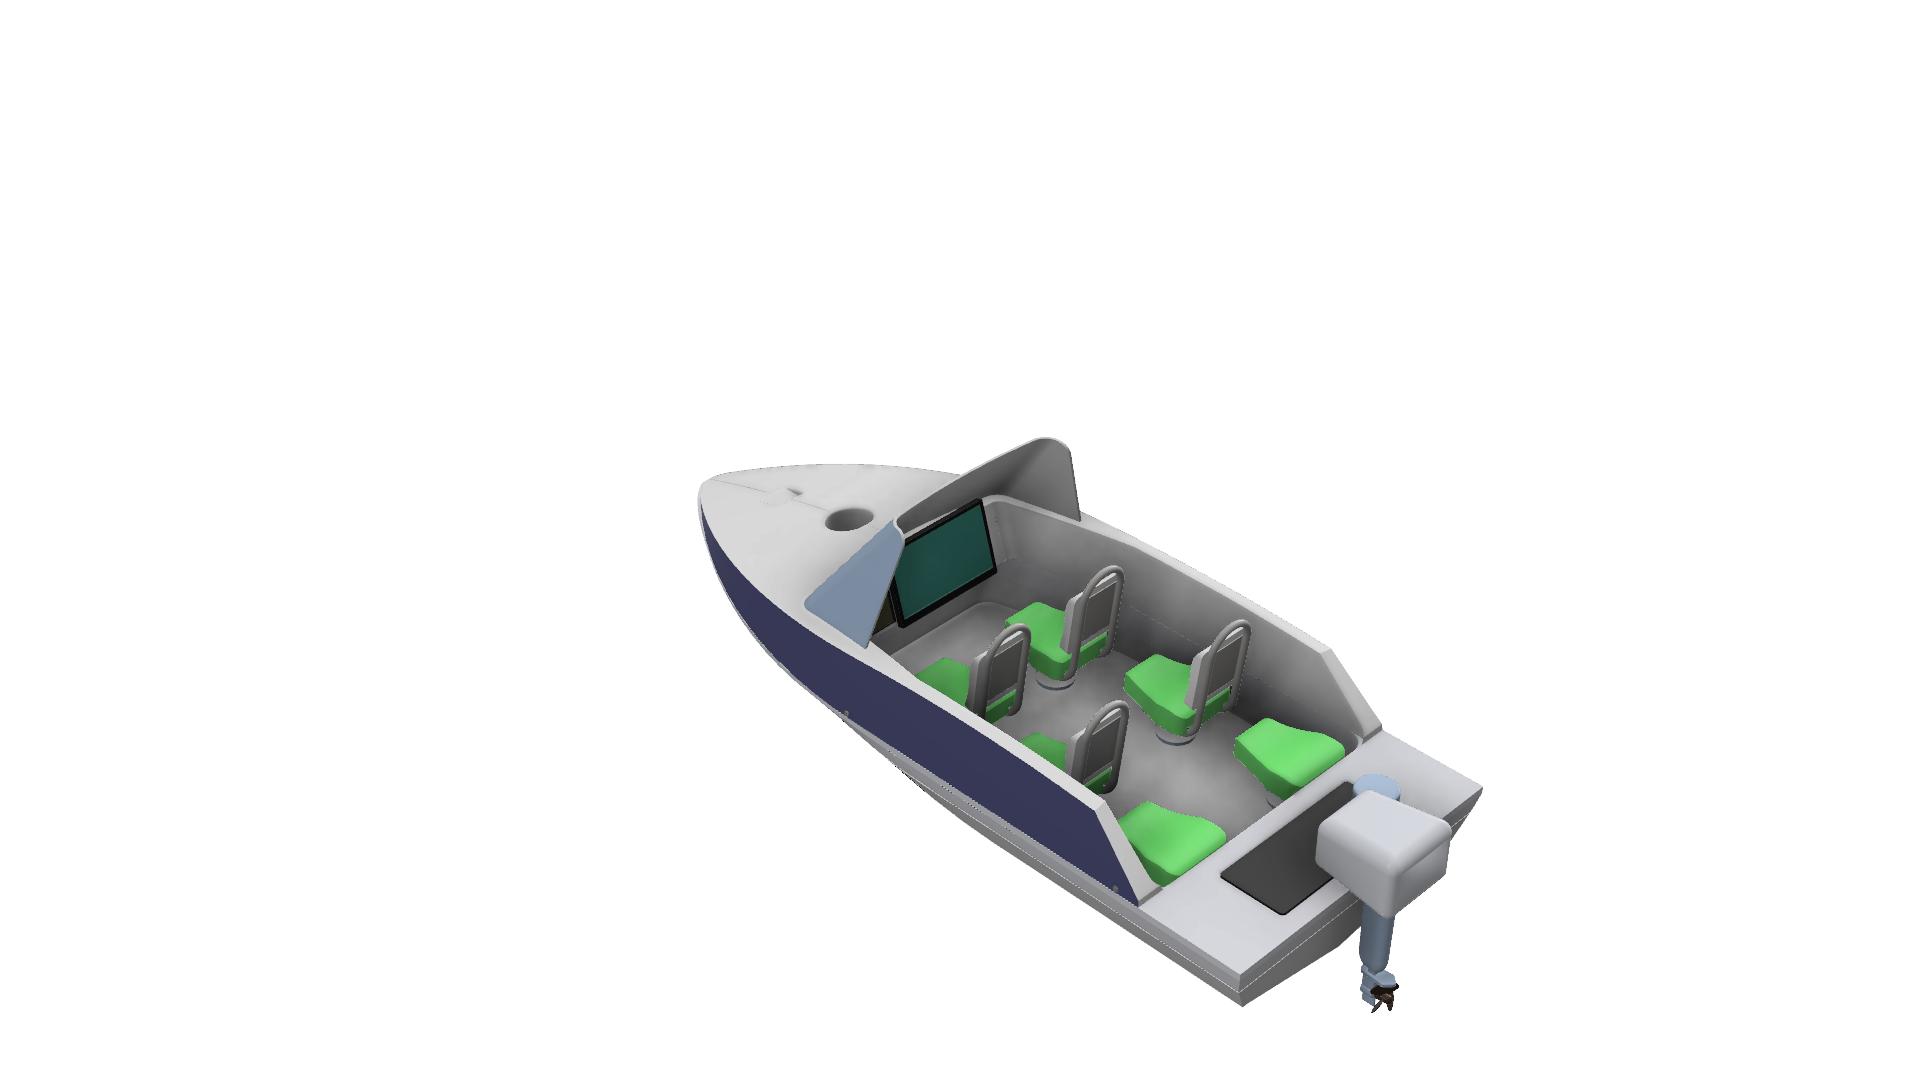 T55-A003 Tacht_ASM_w6Seat v2